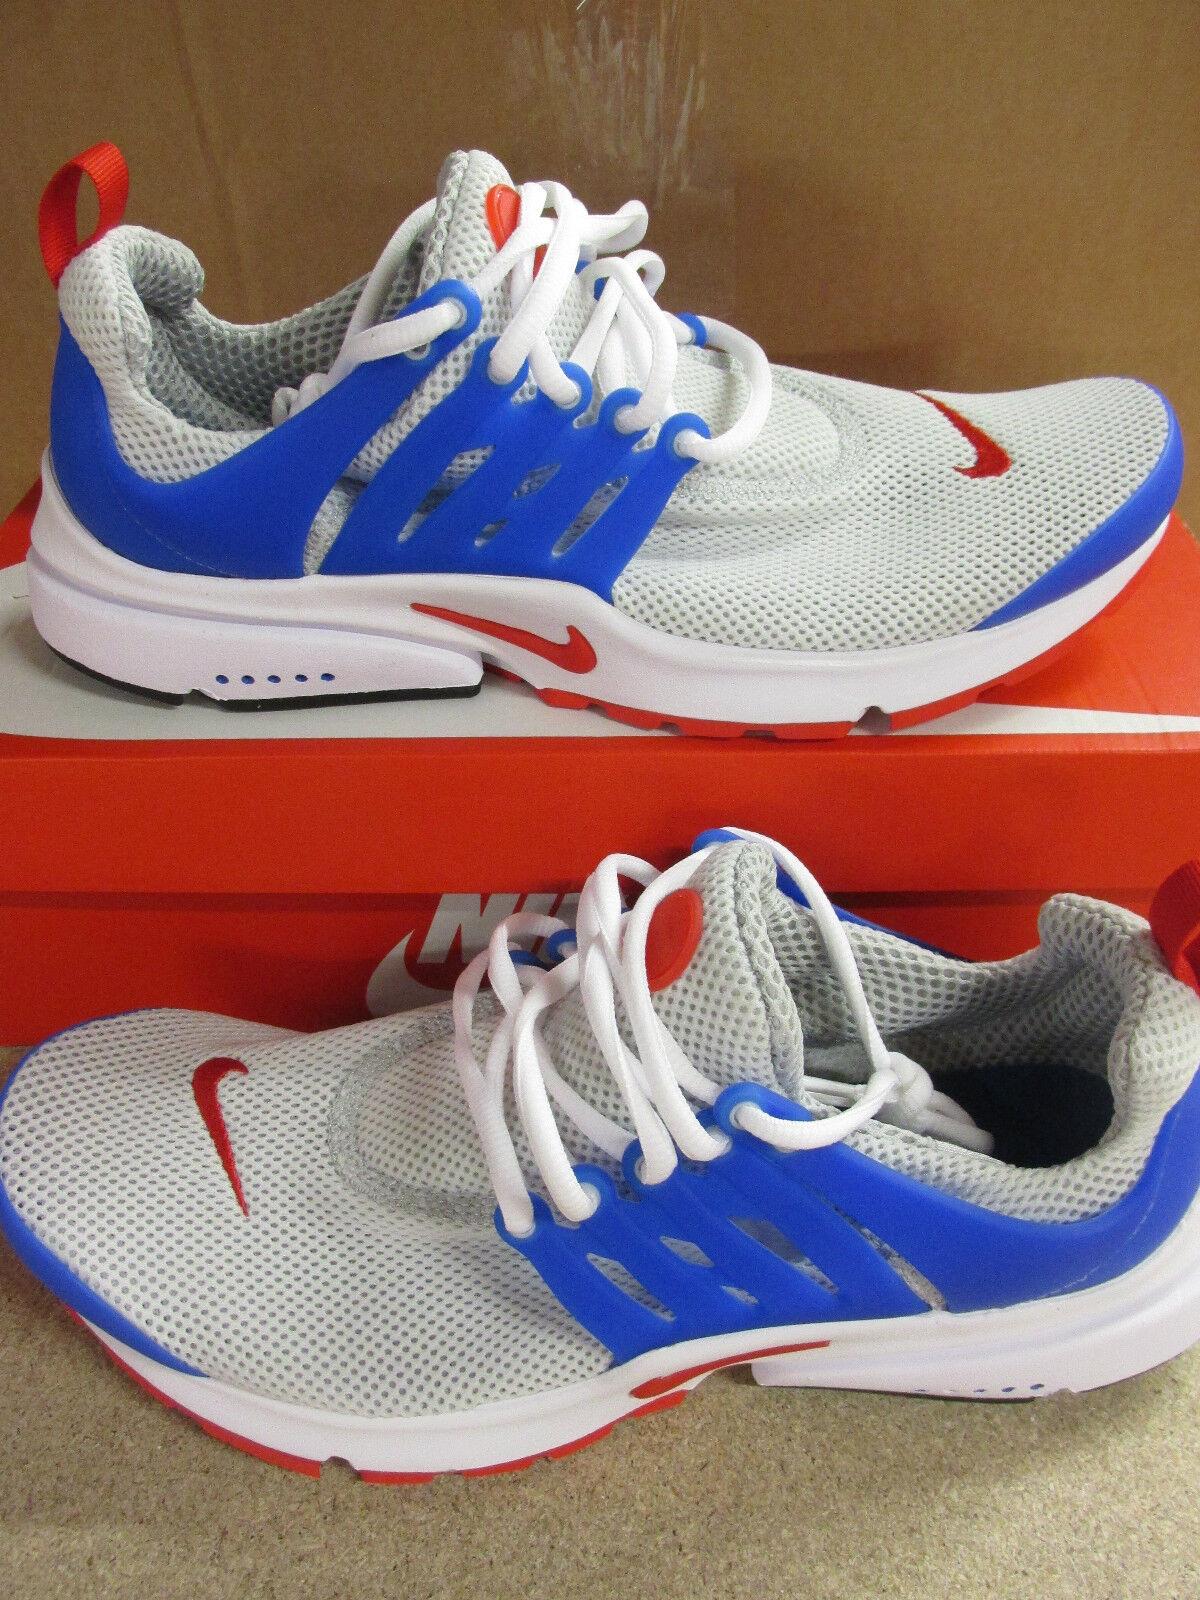 Nike air presto essential mens running trainers 848187 004 sneakers shoes